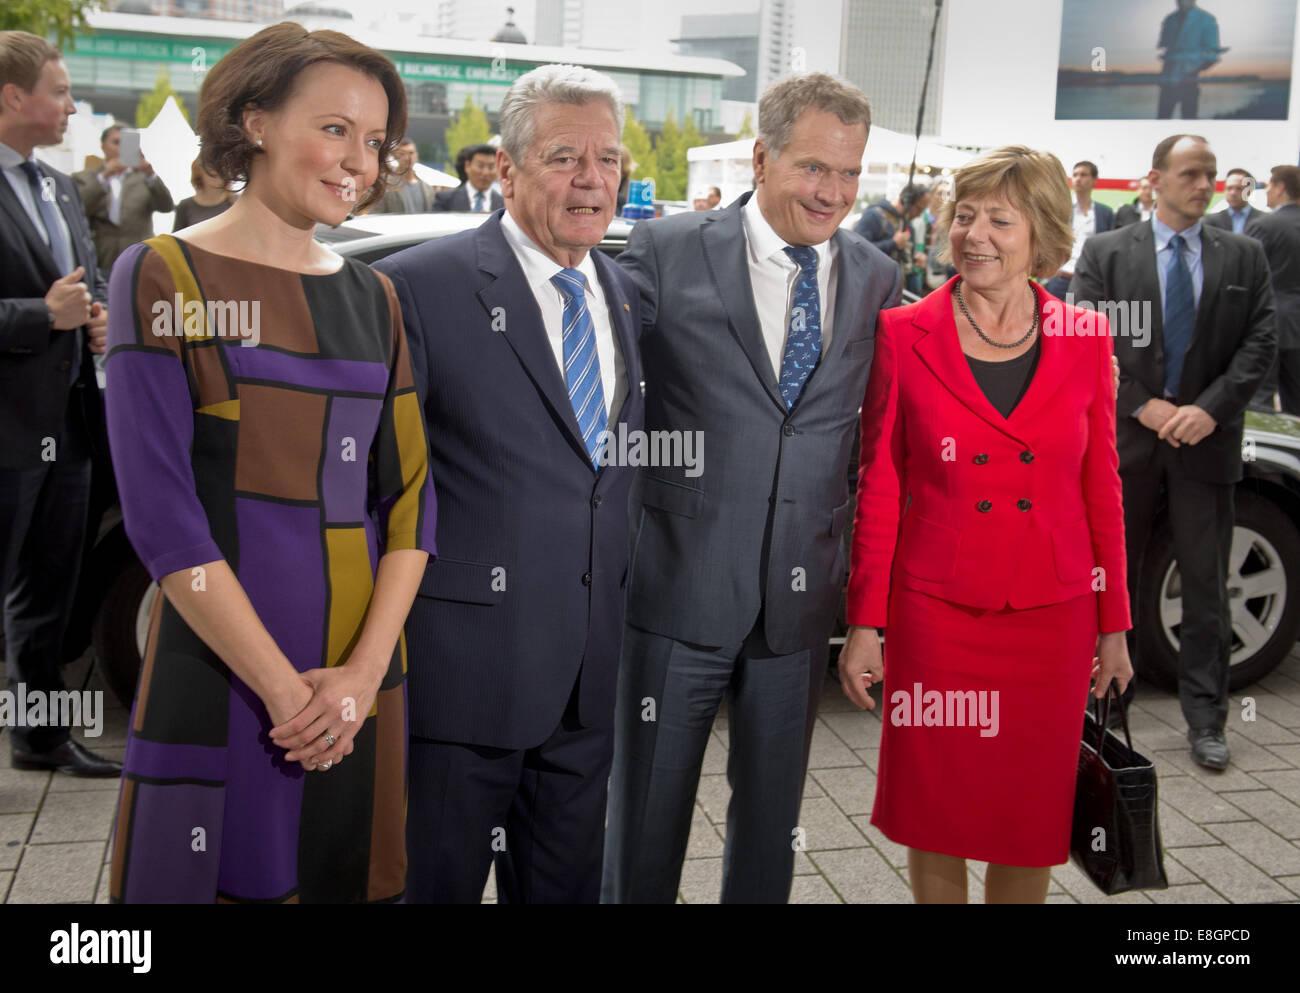 German President Joachim Gauck (2.f.L) and his partner Daniela Schadt (R) greet the Finnish President Sauli Niinisto - Stock Image